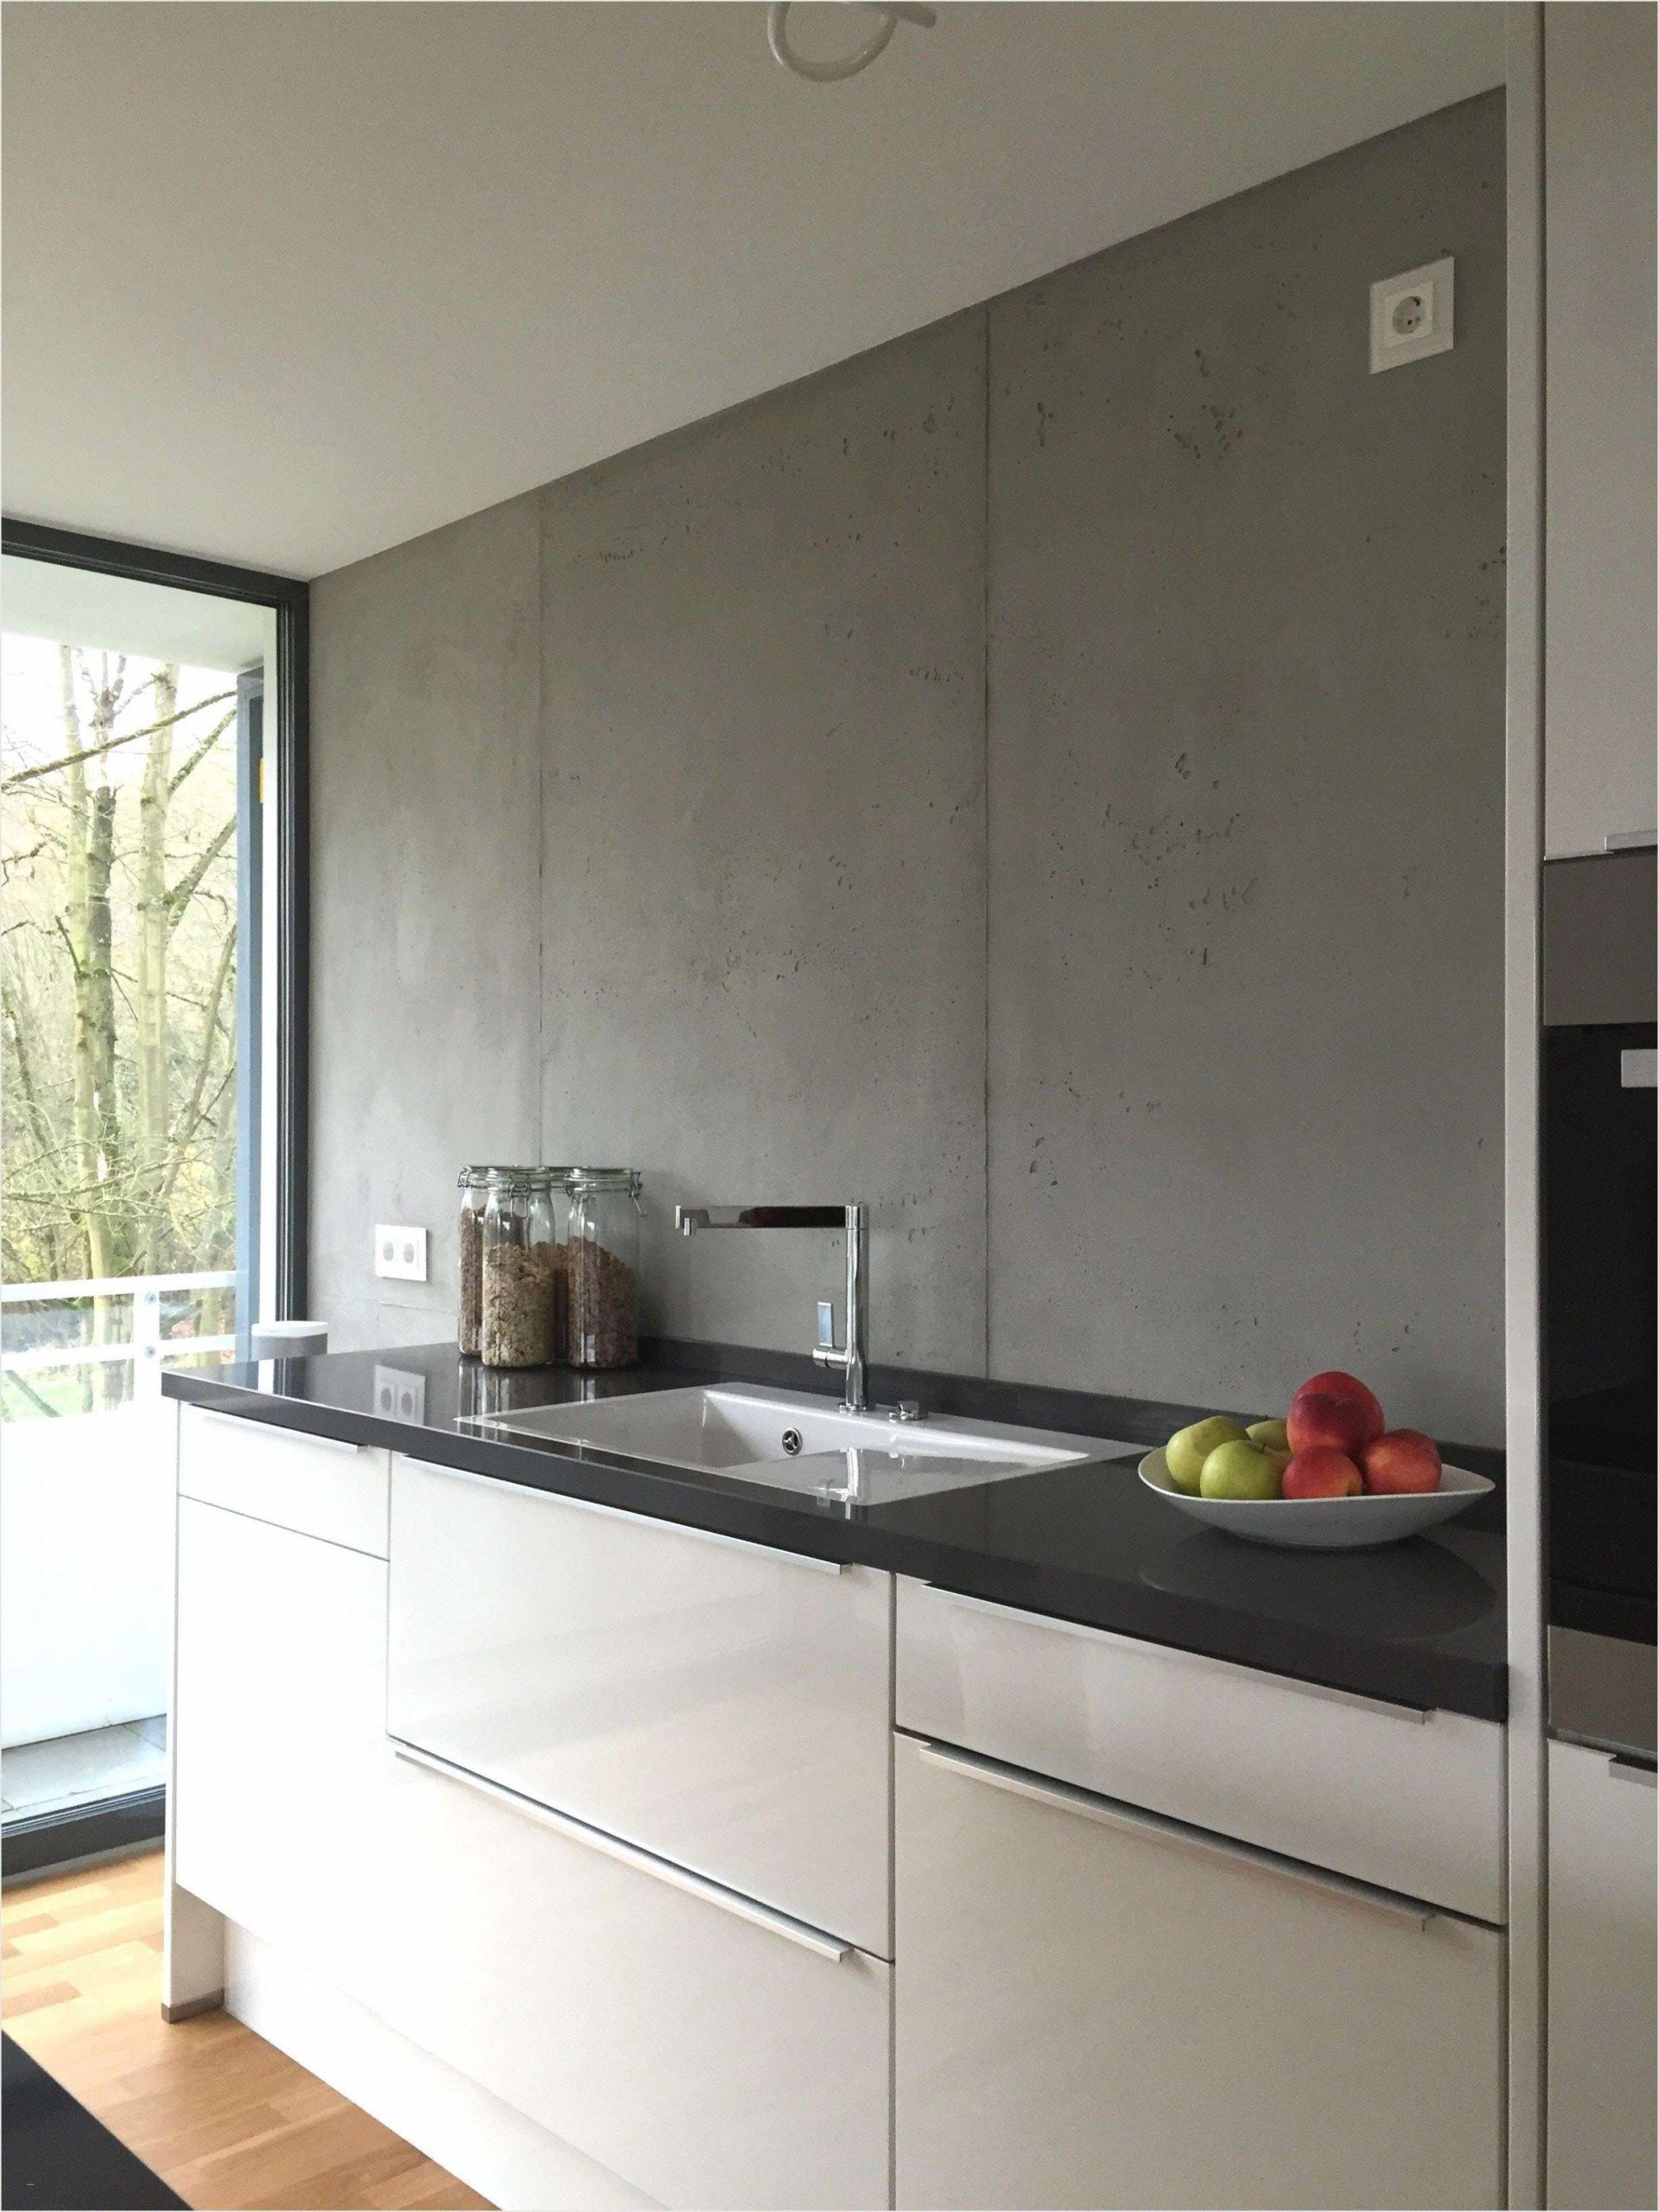 Full Size of 23 Top Abwaschbare Tapete Küche   Abwaschbare Farbe Küchenrückwand Küche Tapete Küche